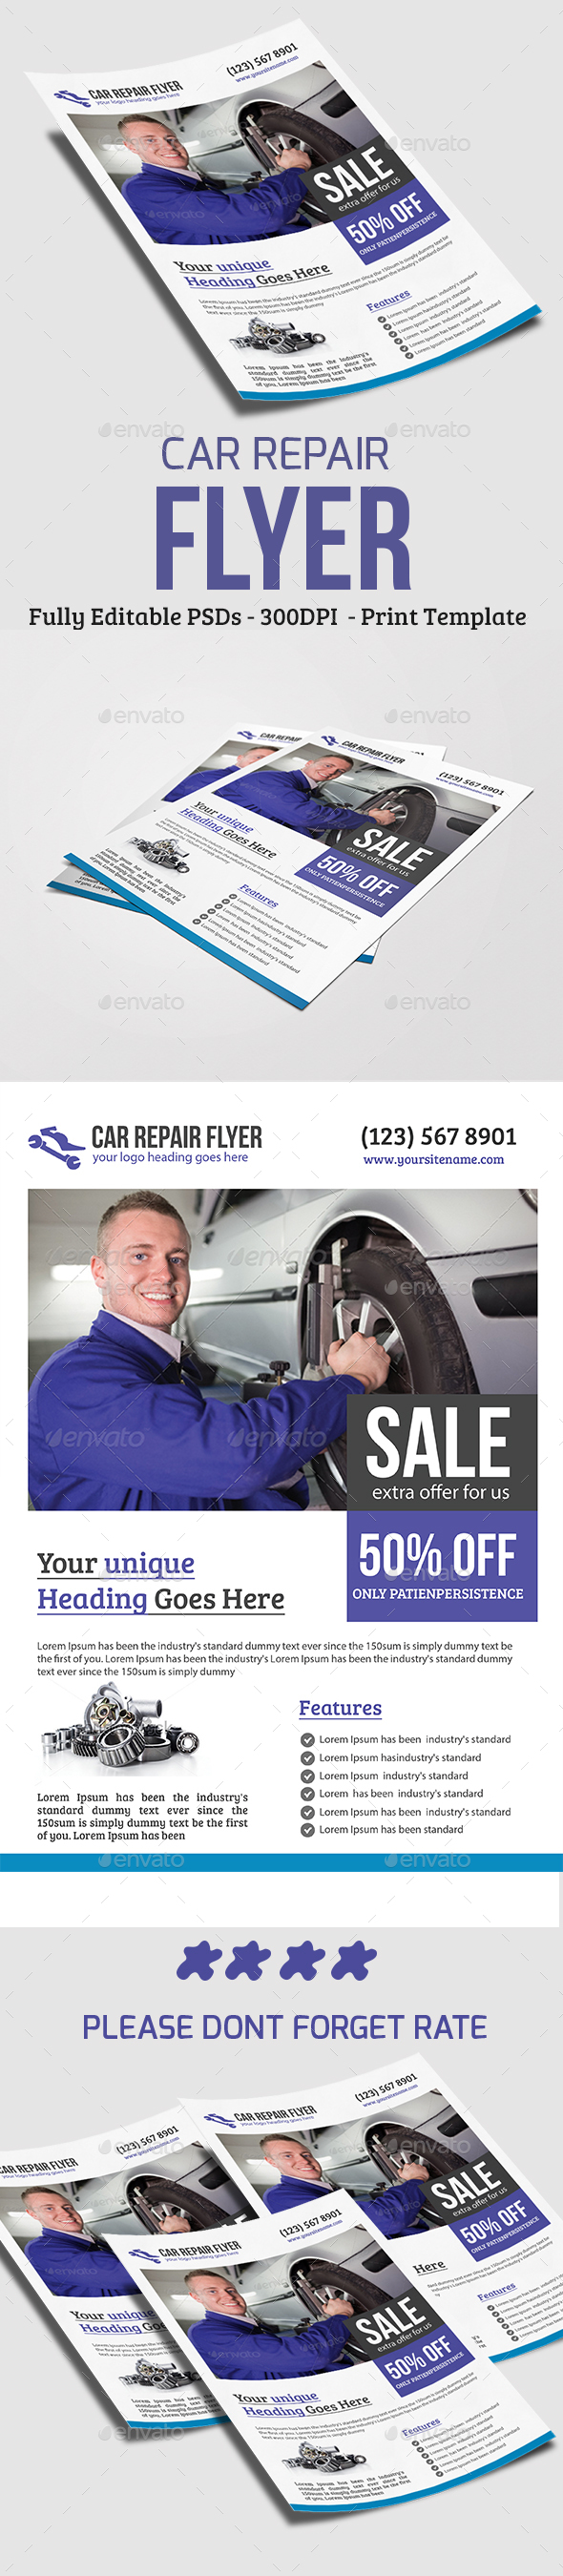 Car Repair Flyer - Flyers Print Templates